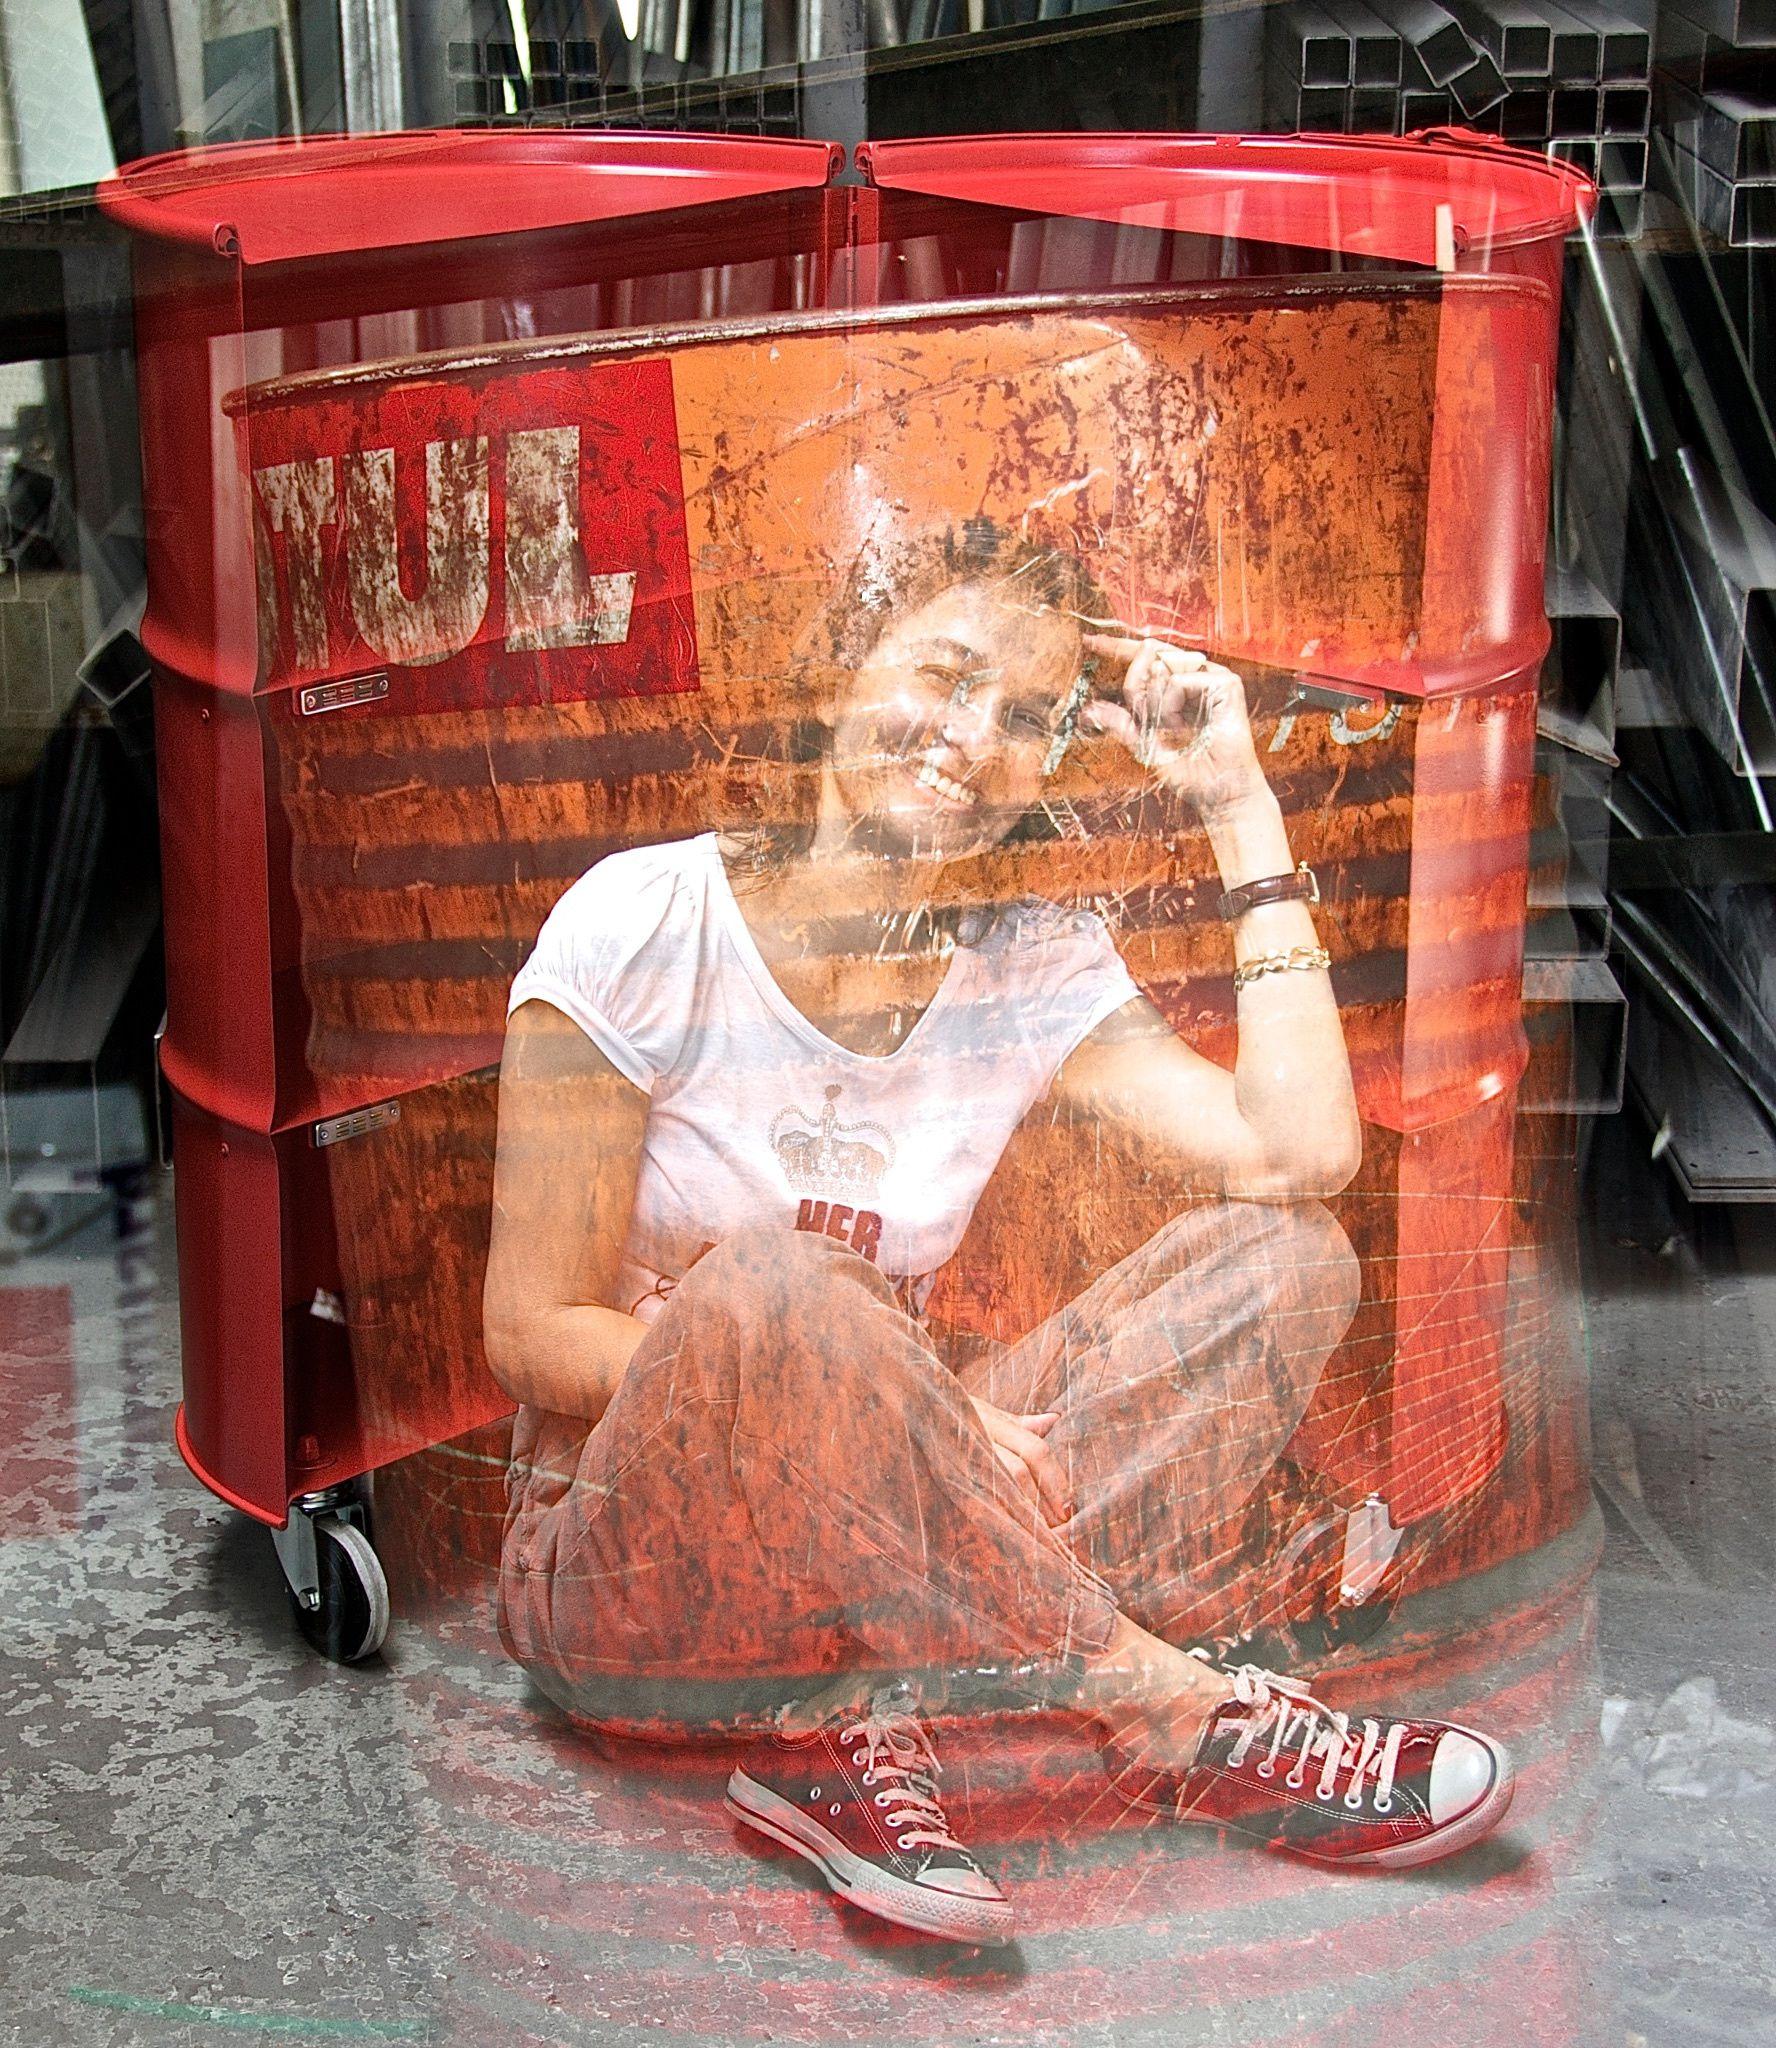 francesca cutini in triennale #milan #barrel12 #oilbarrel ...